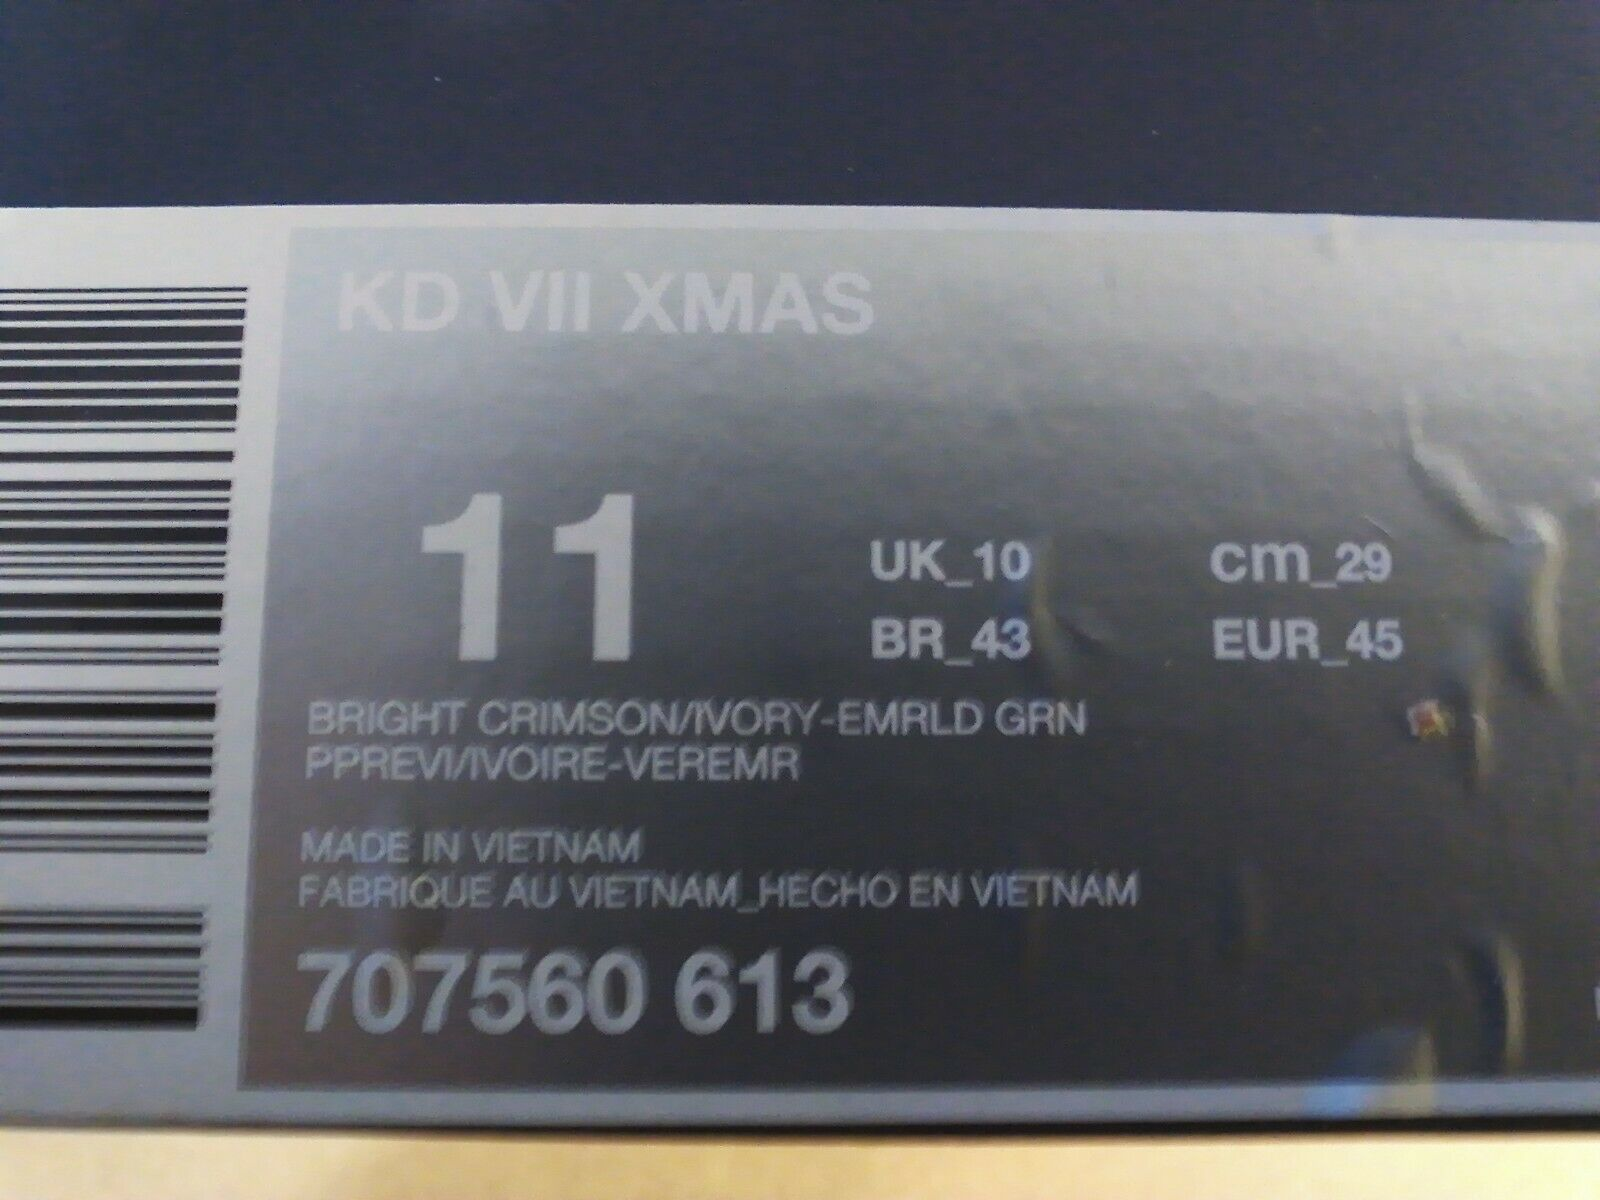 Nike KD VII XMAS    Size 11    color = Bright Crimson Ivory - Emerald Green